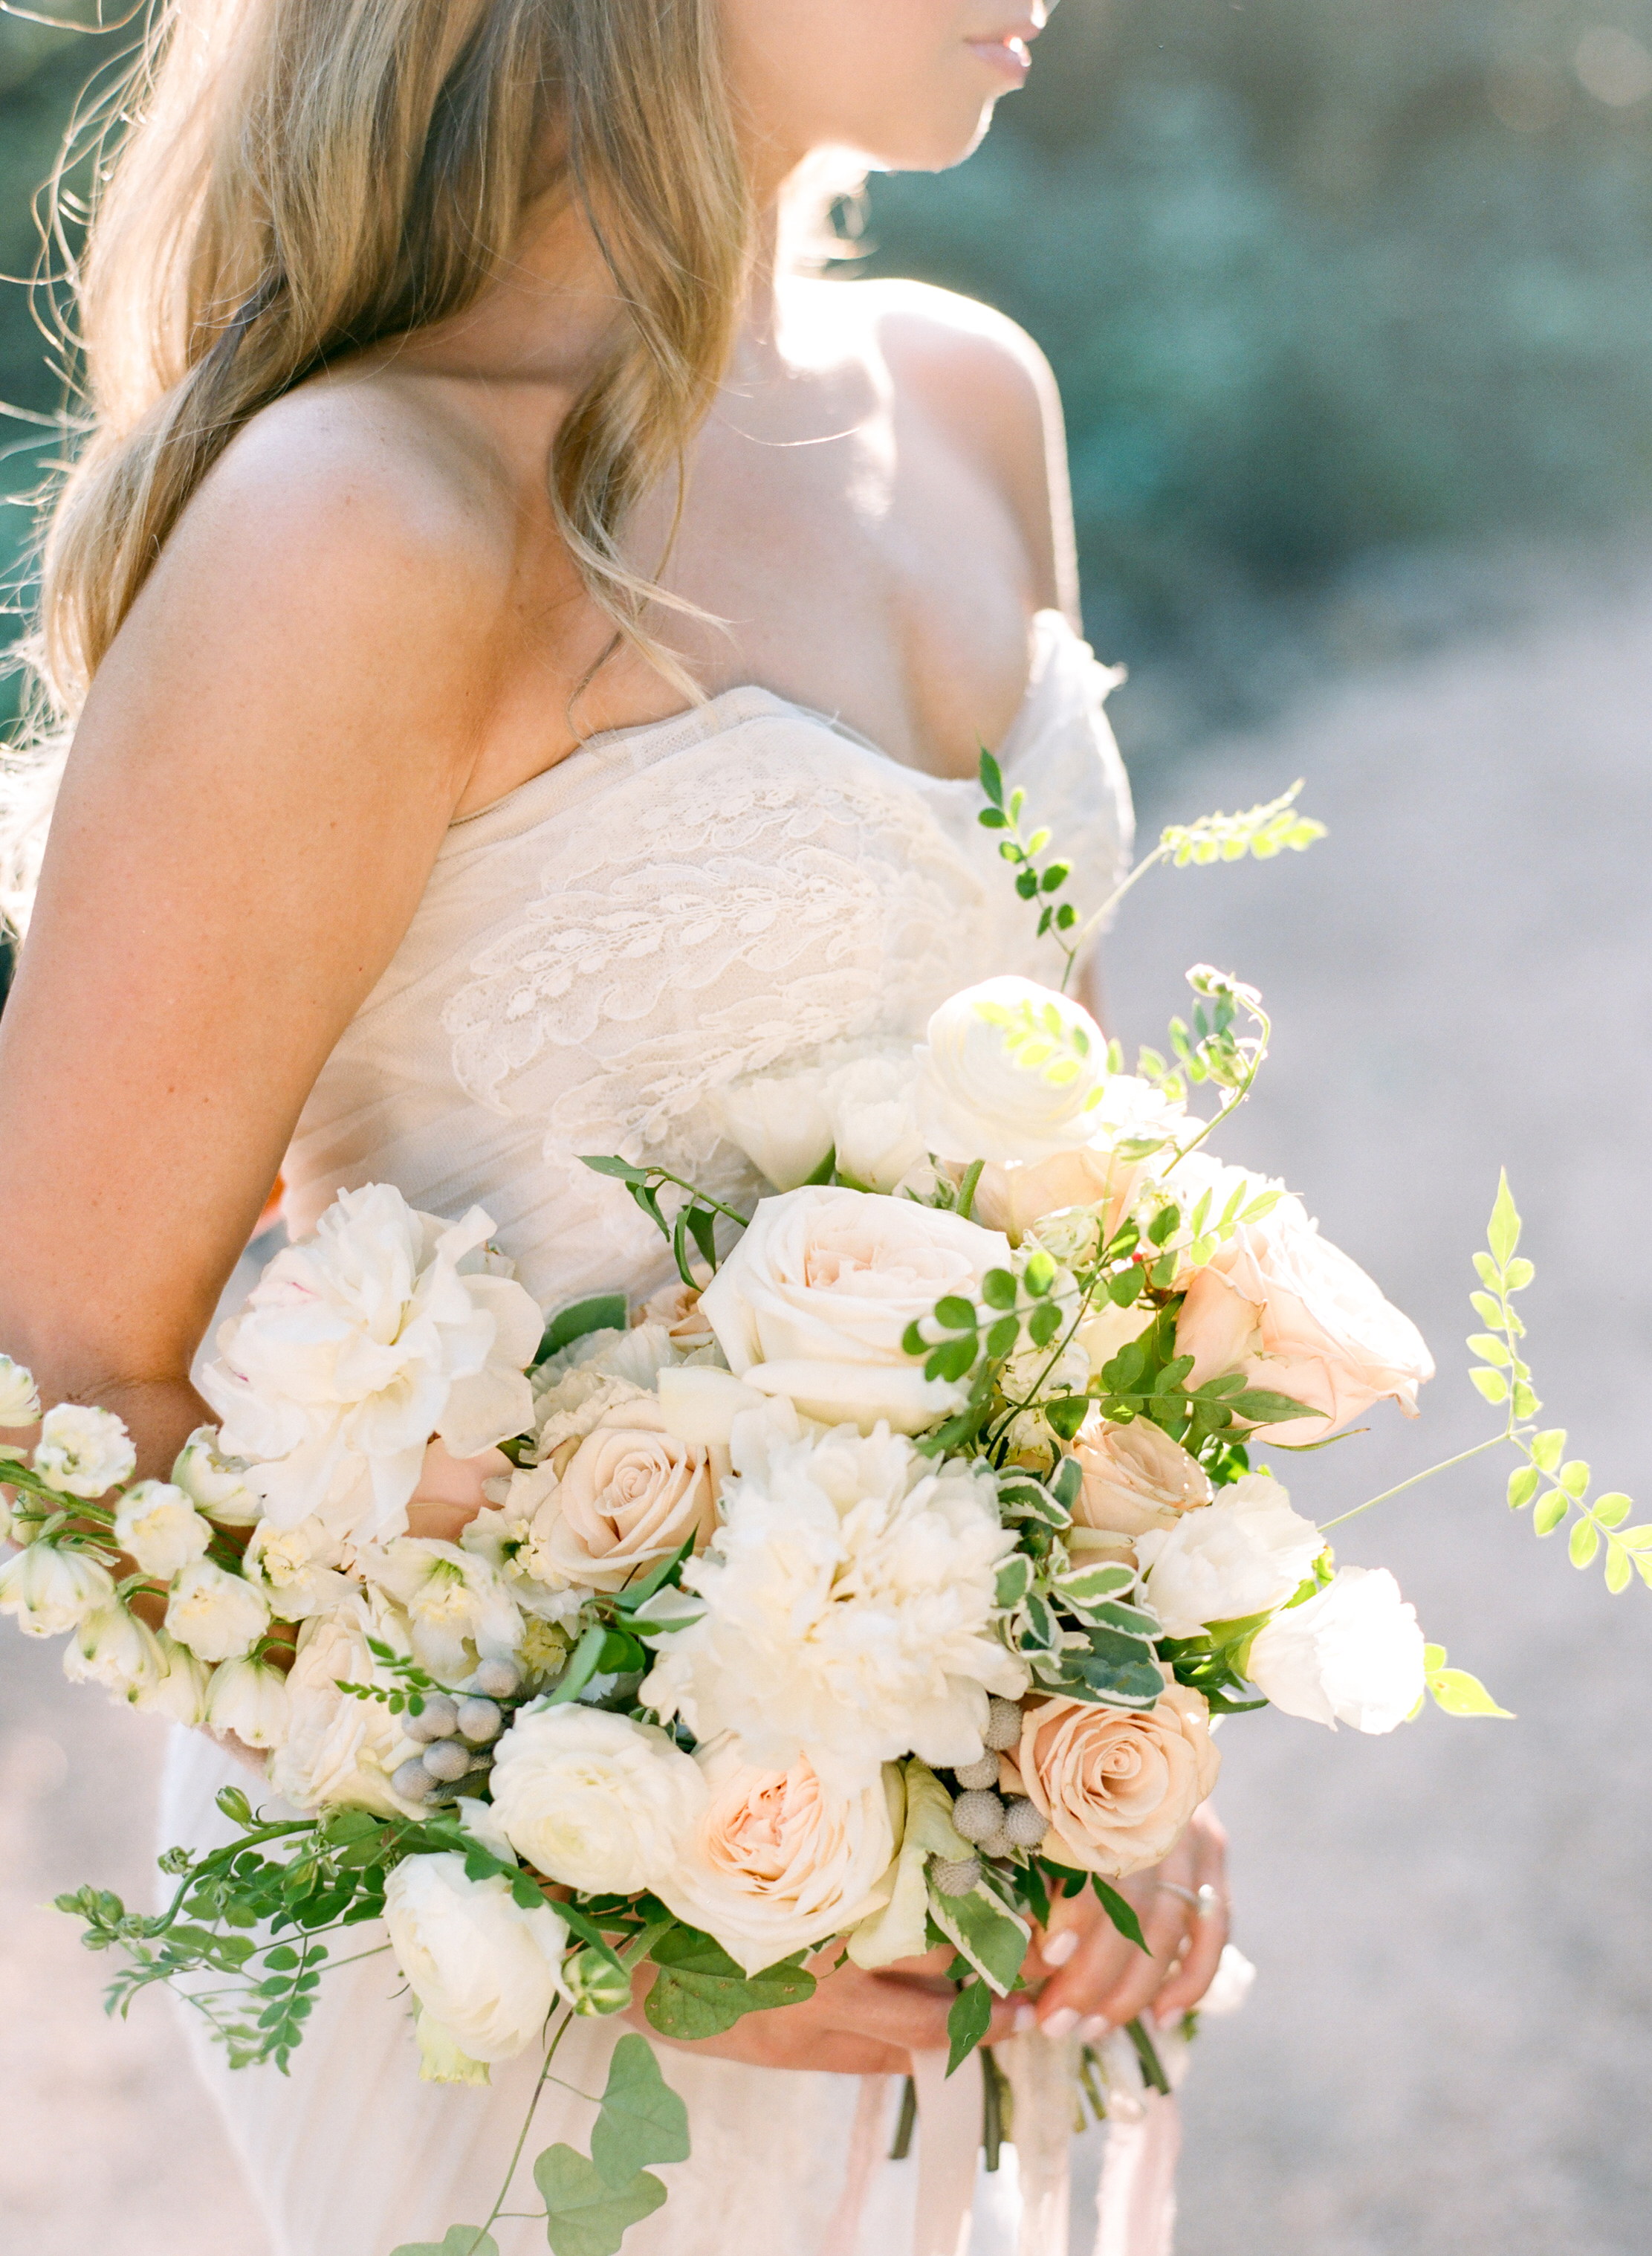 dana-fernandez-photography-the-wedding-chicks-film-houston-wedding-photography-destination-16.jpg